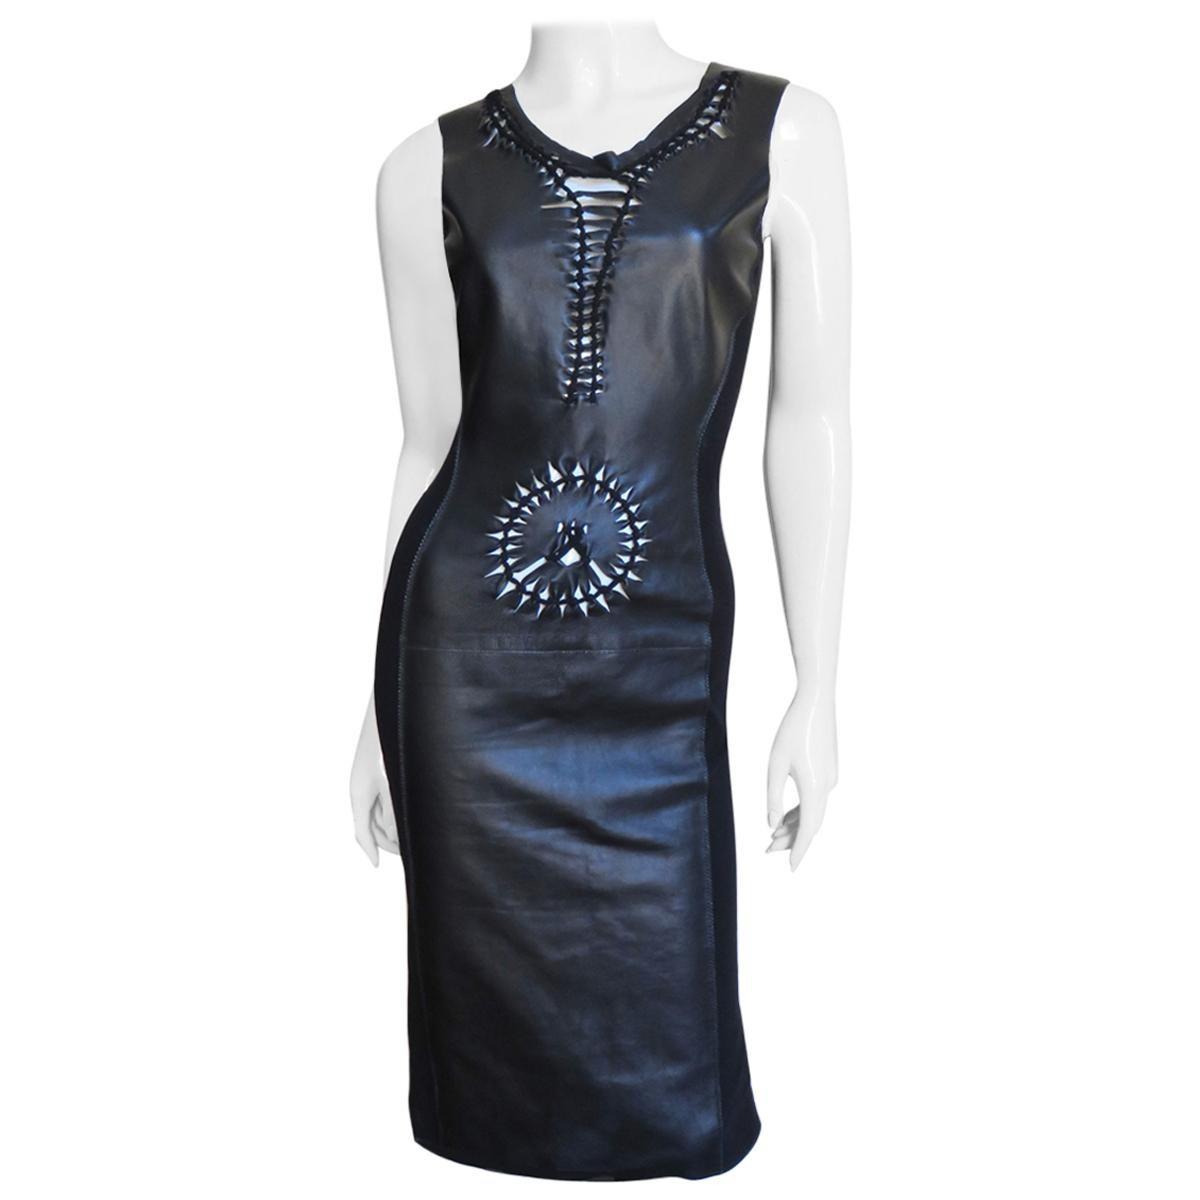 Jean Paul Gaultier Leather Bodycon Dress